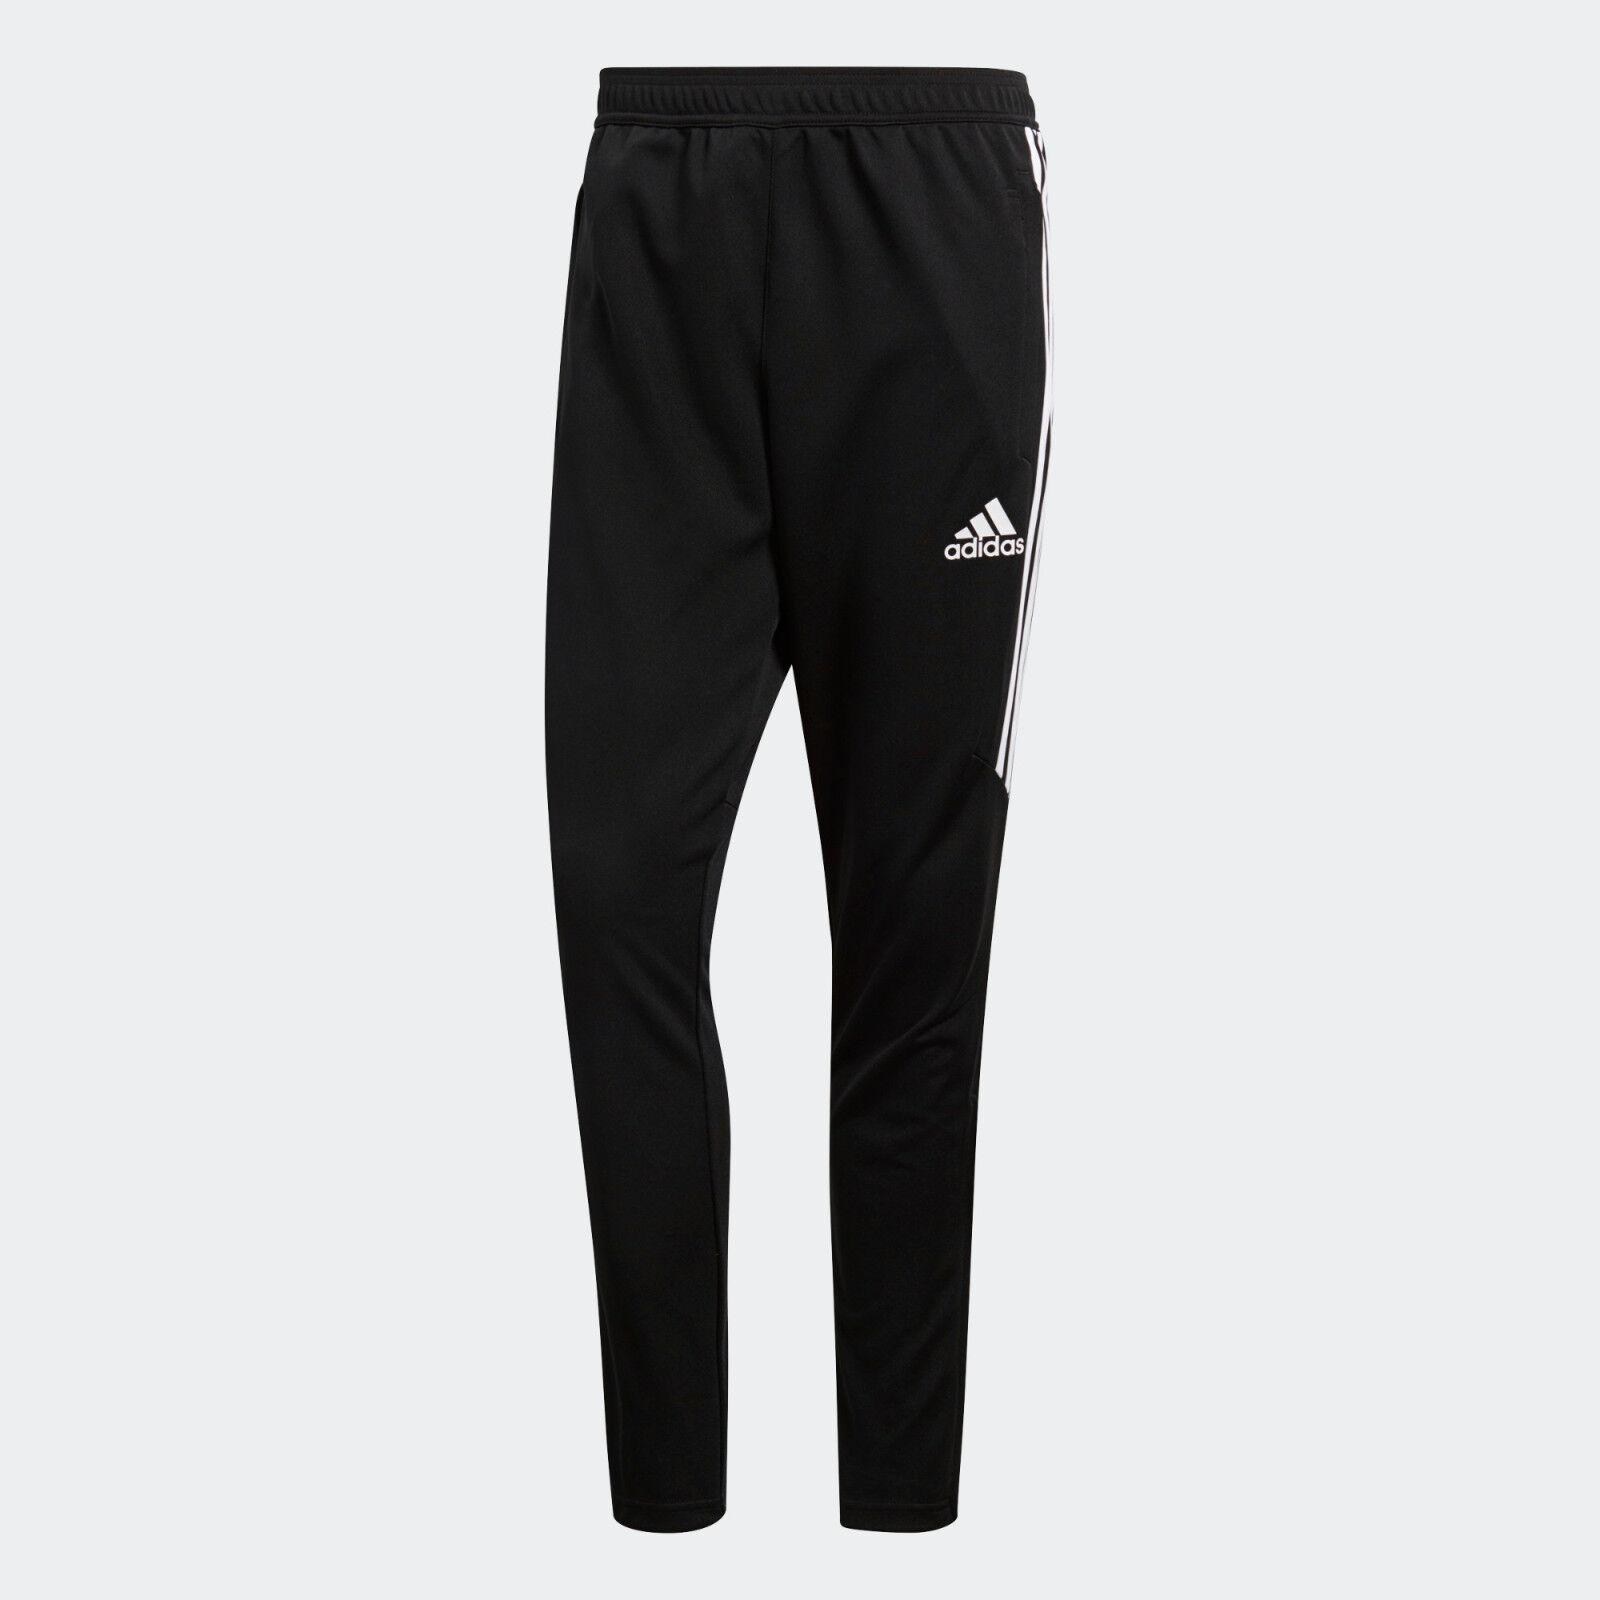 Mens Adidas Tiro 17 Black Sport Athletic Soccer Training Pants BS3693 Sz SML-XXL